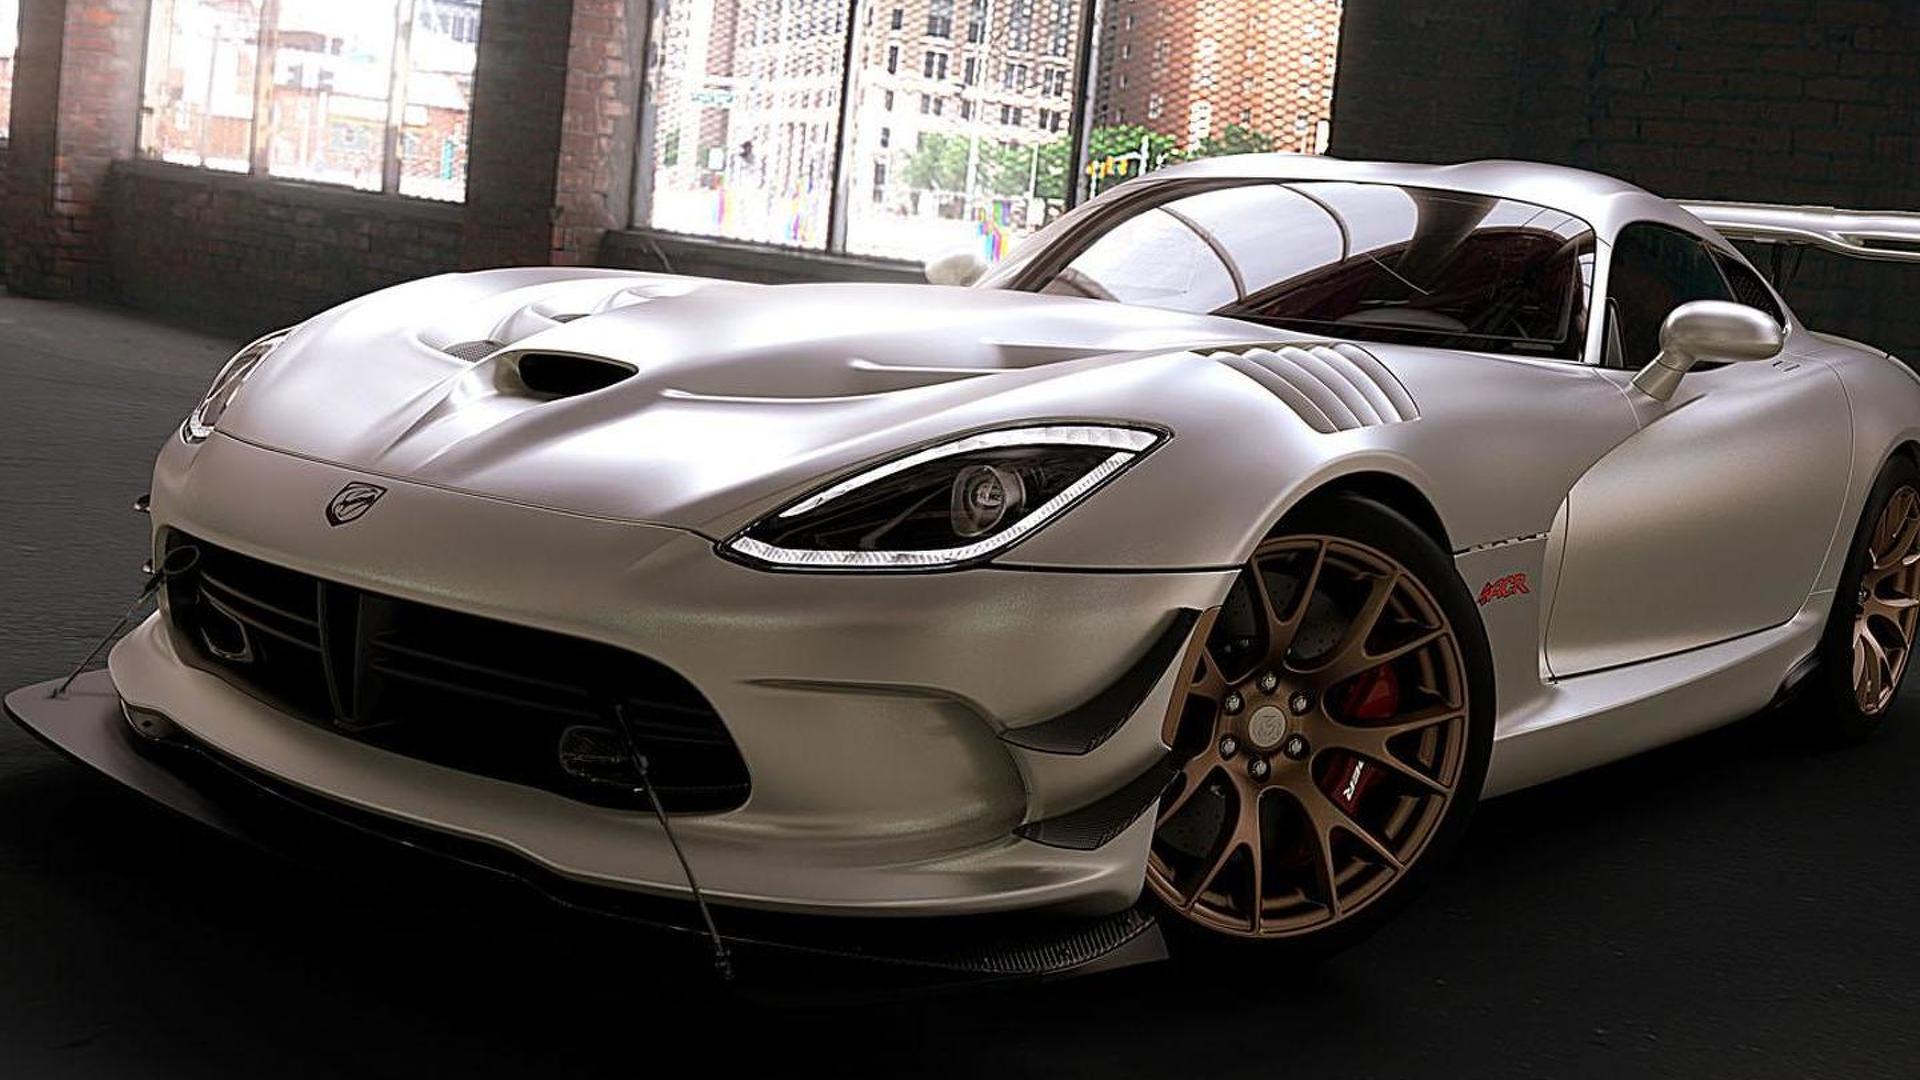 2016 Dodge Viper gains 8,000 new matte paint options